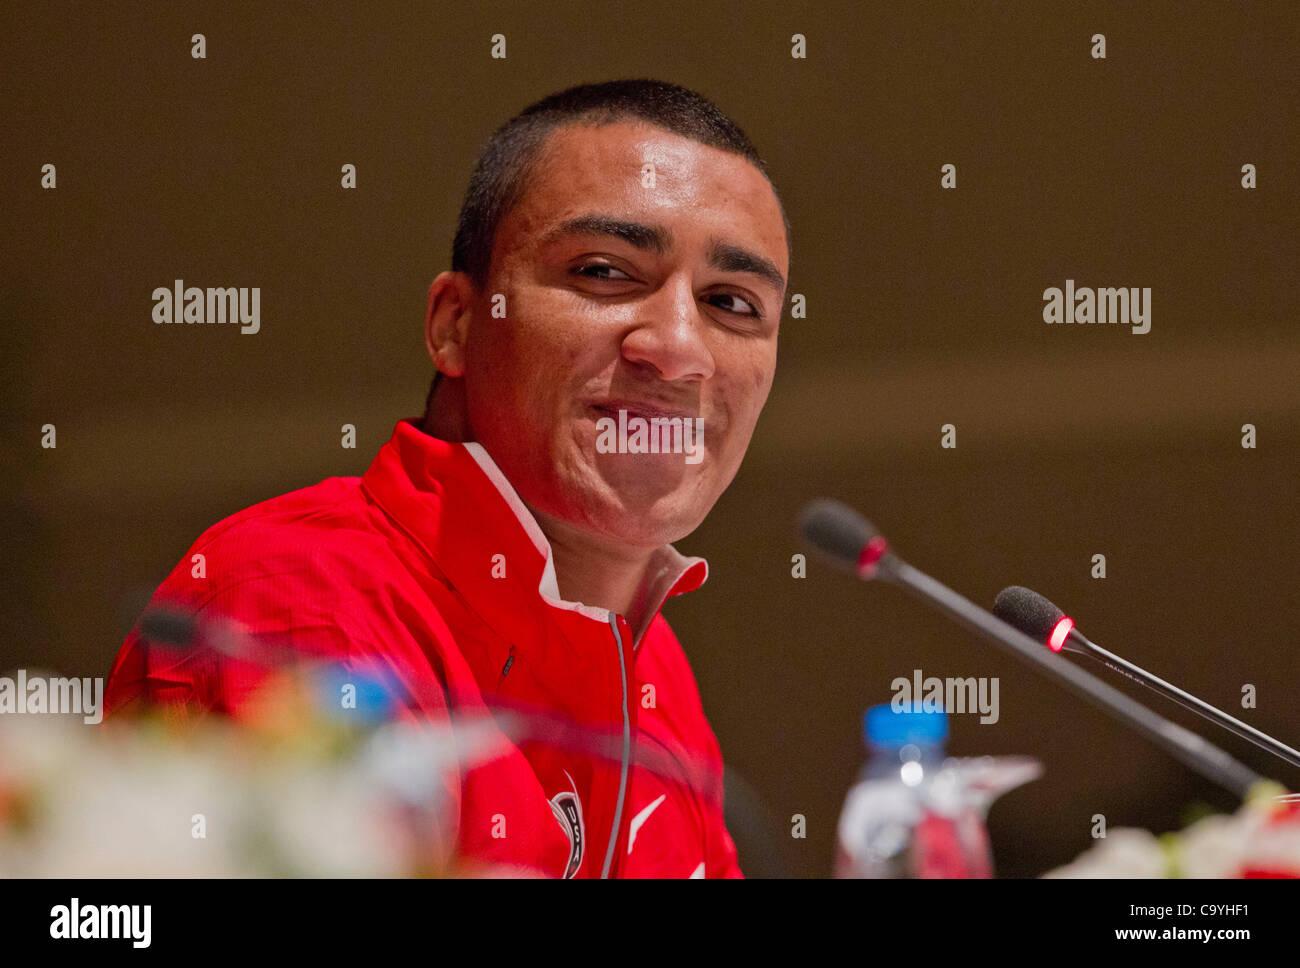 ISTANBUL, TURCHIA: Giovedì 8 marzo 2012, Ashton Eaton degli Stati Uniti d'America (USA), heptathlon detentore Immagini Stock